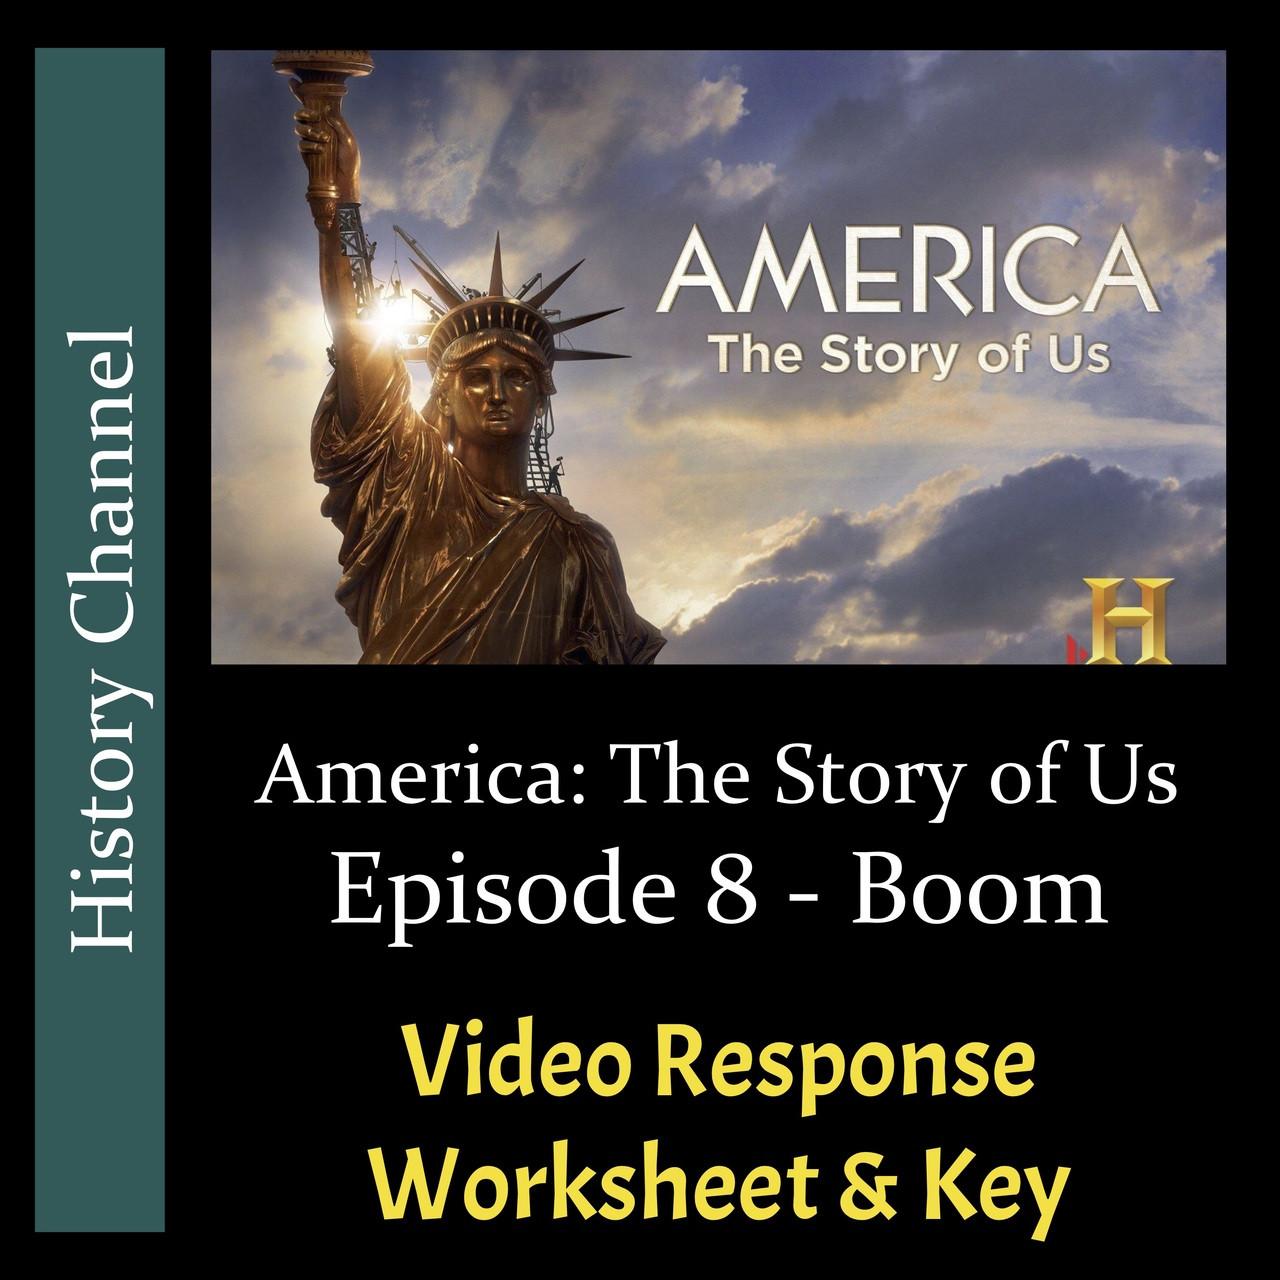 America The Story of Us - Episode 08: Boom - Video Response Worksheet & Key (Editable)